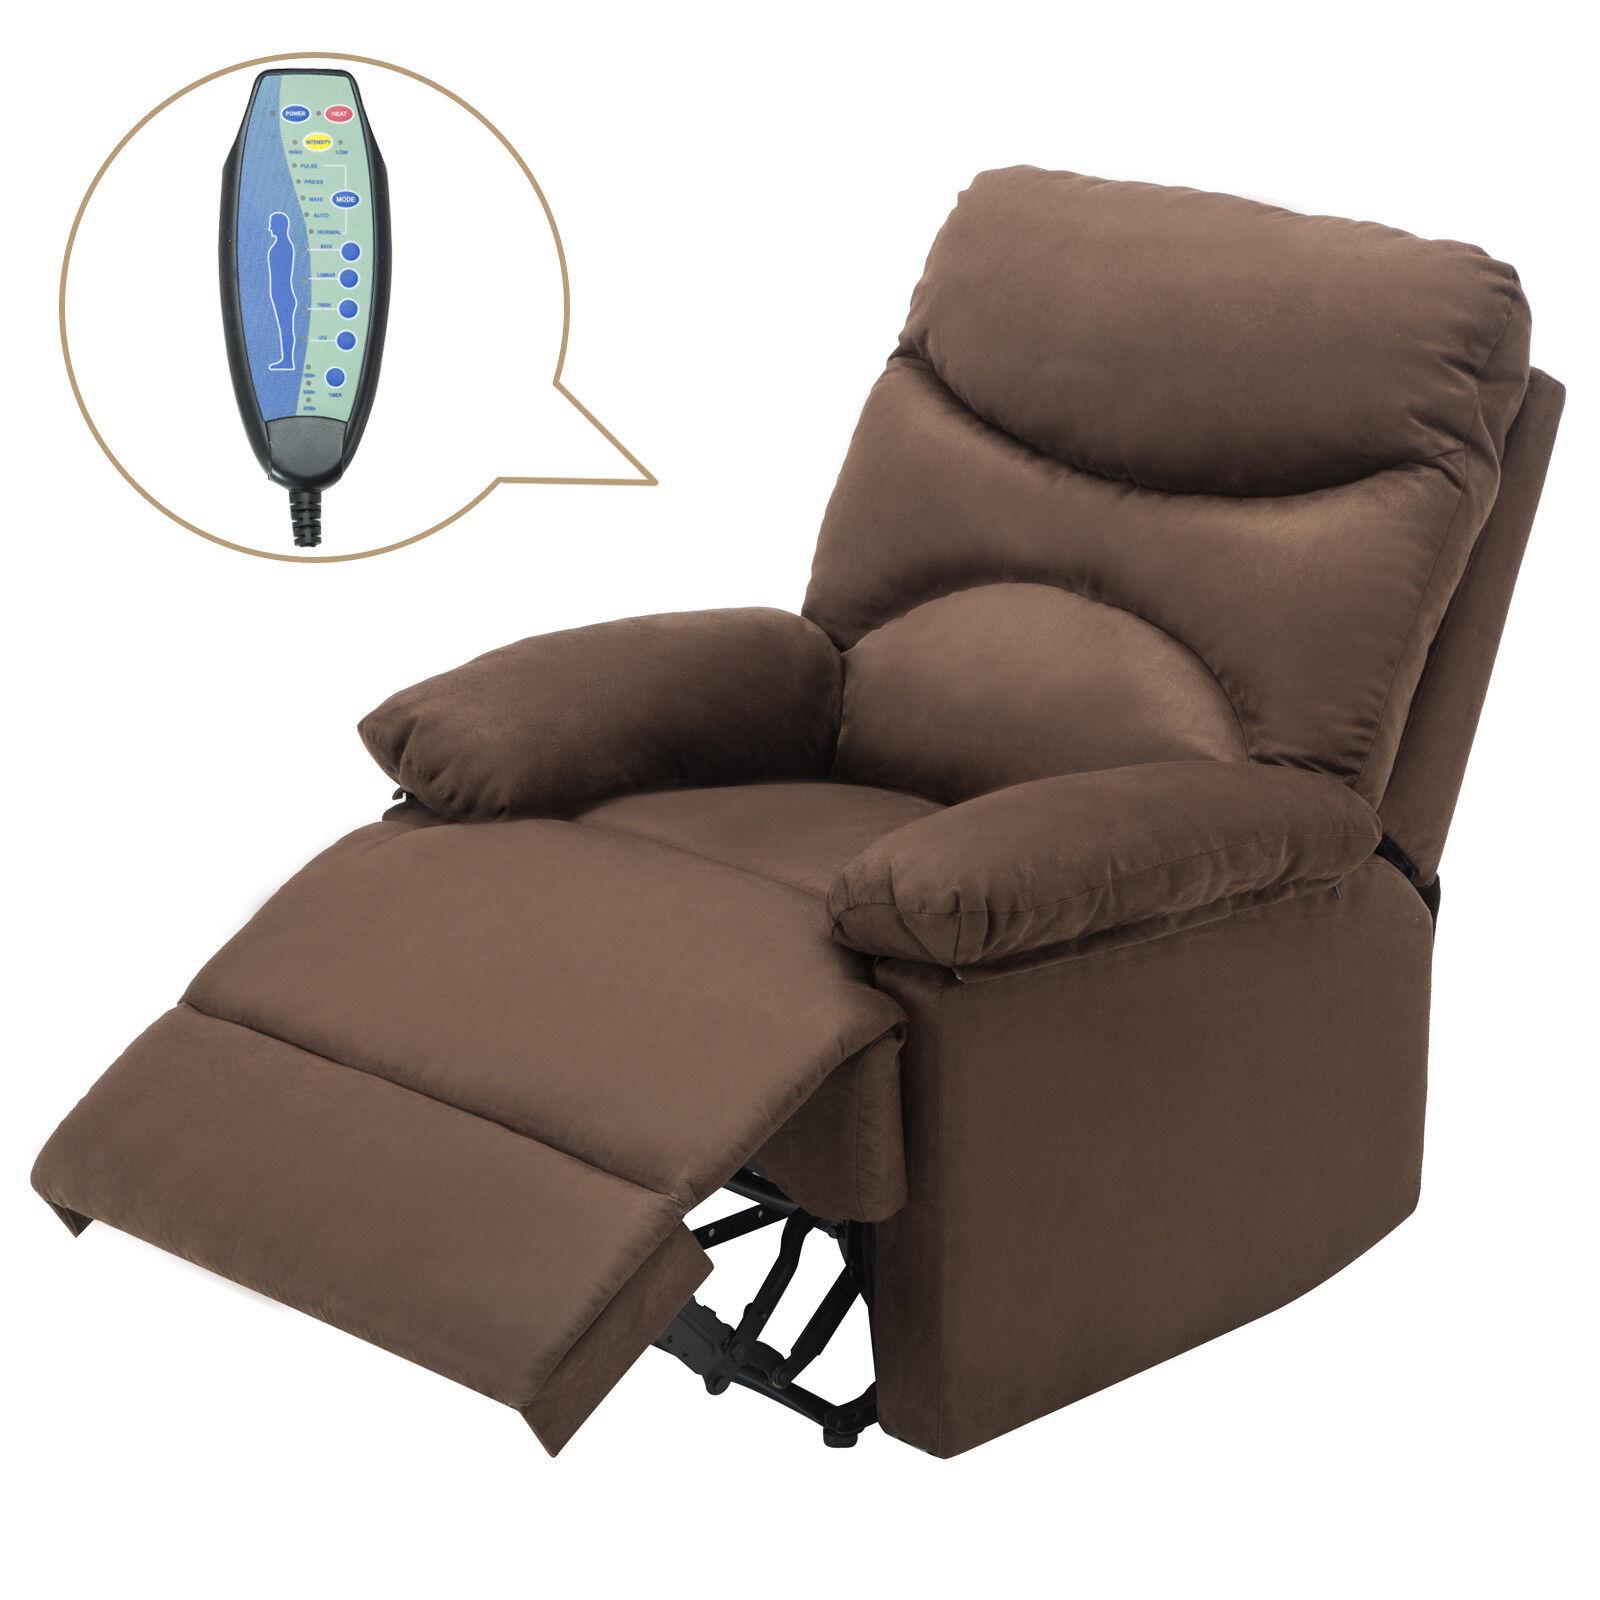 Microfiber Mage Recliner Sofa Chair